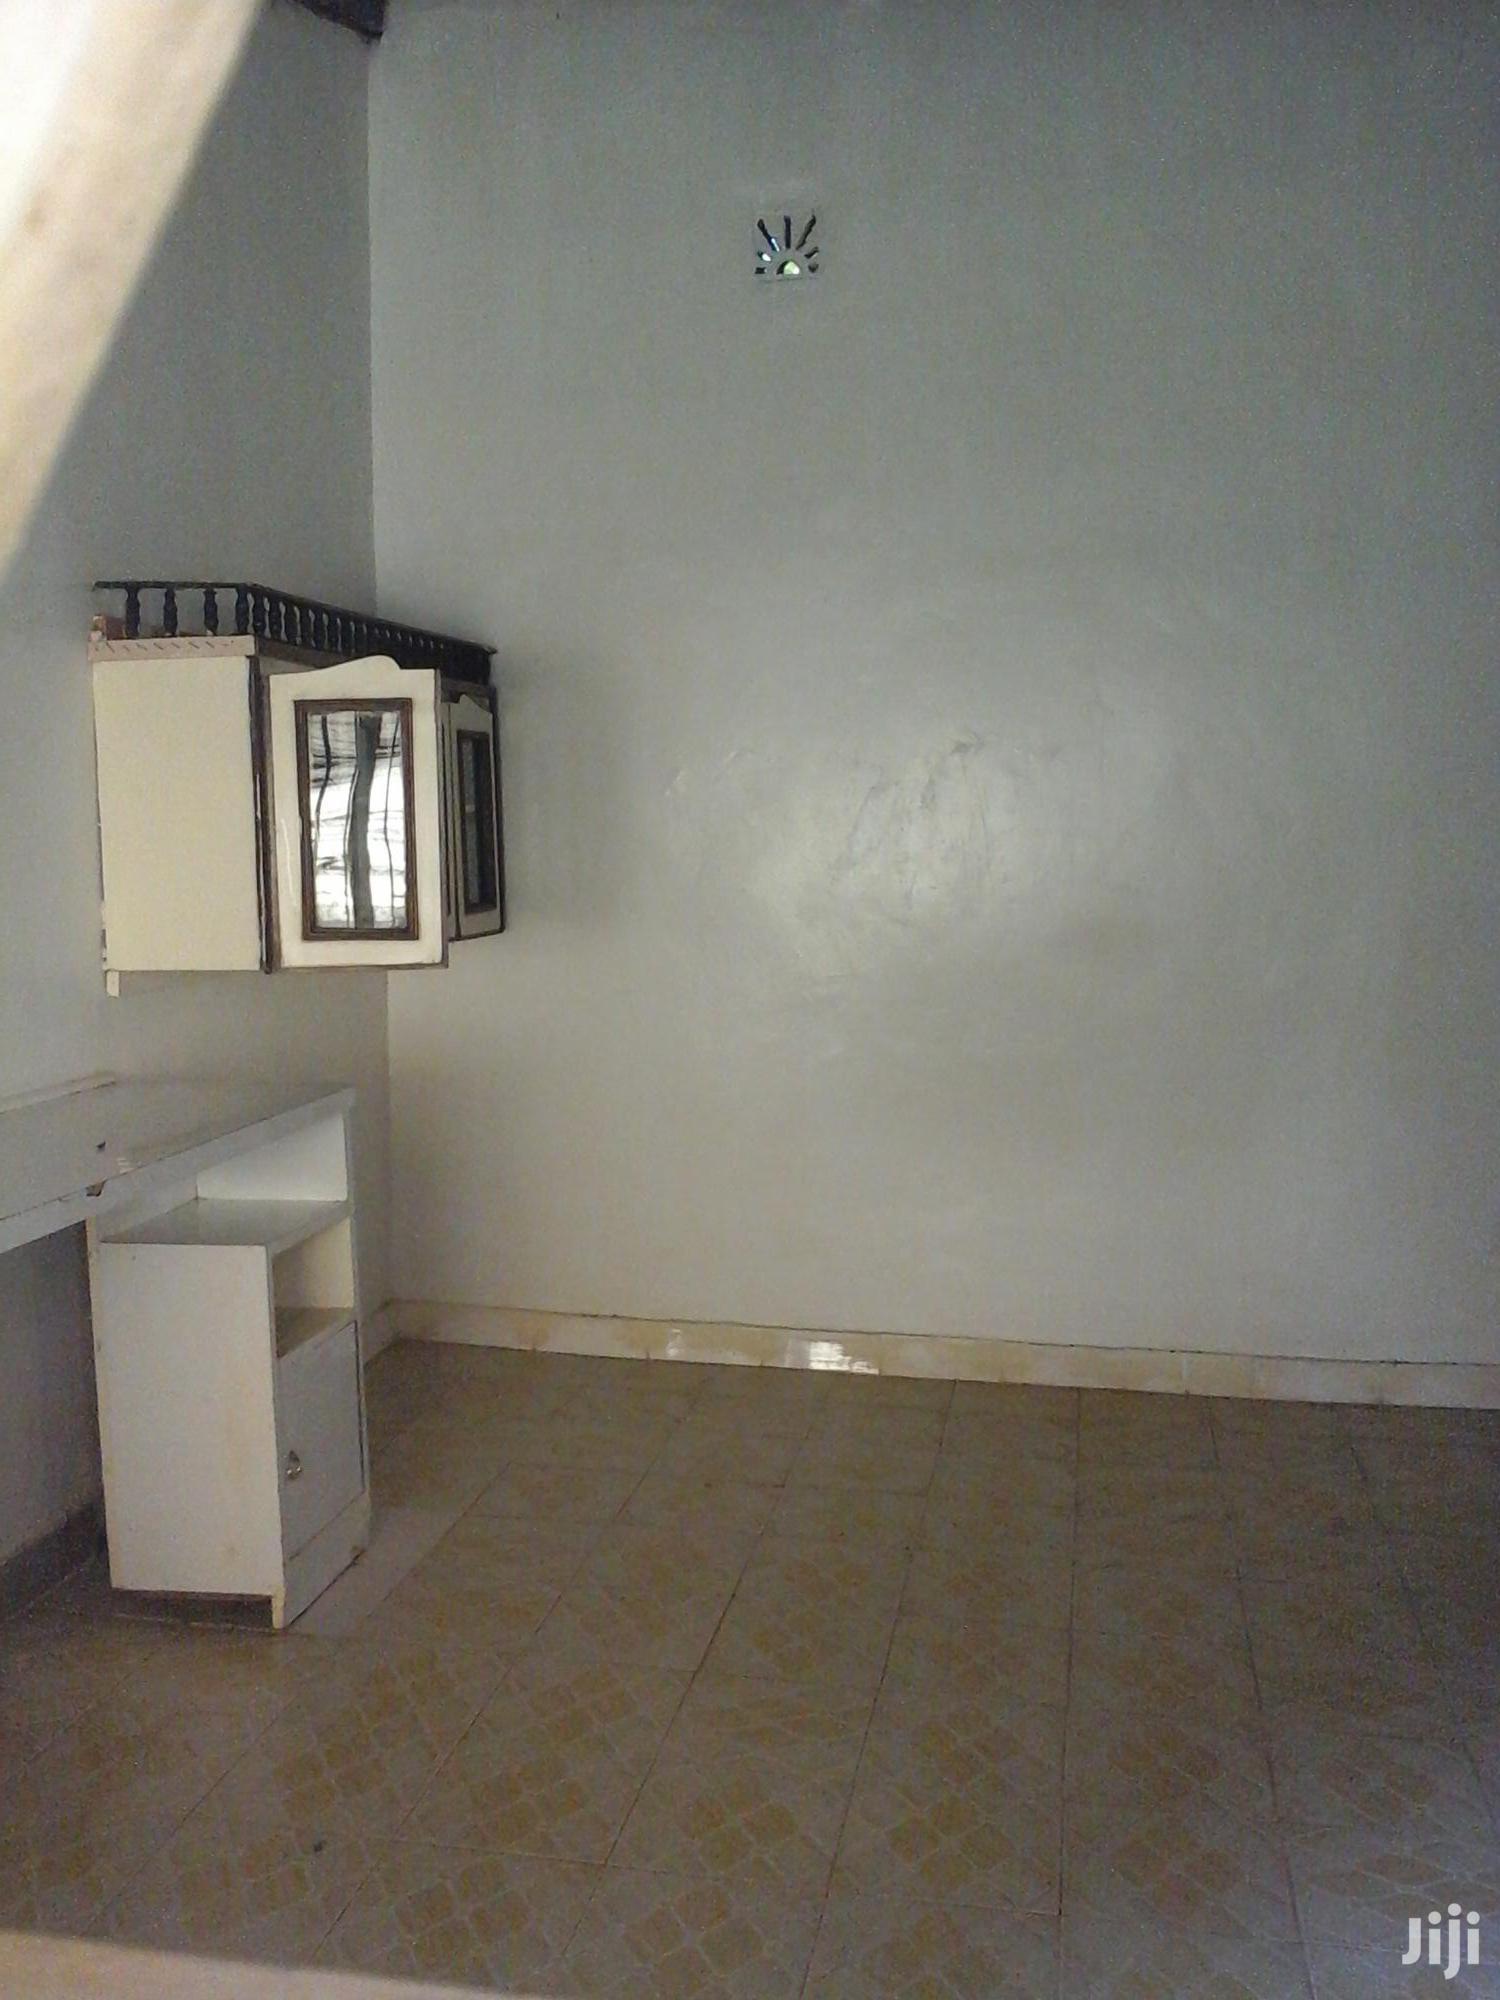 Spacious Bedsitter | Houses & Apartments For Rent for sale in Lavington, Nairobi, Kenya